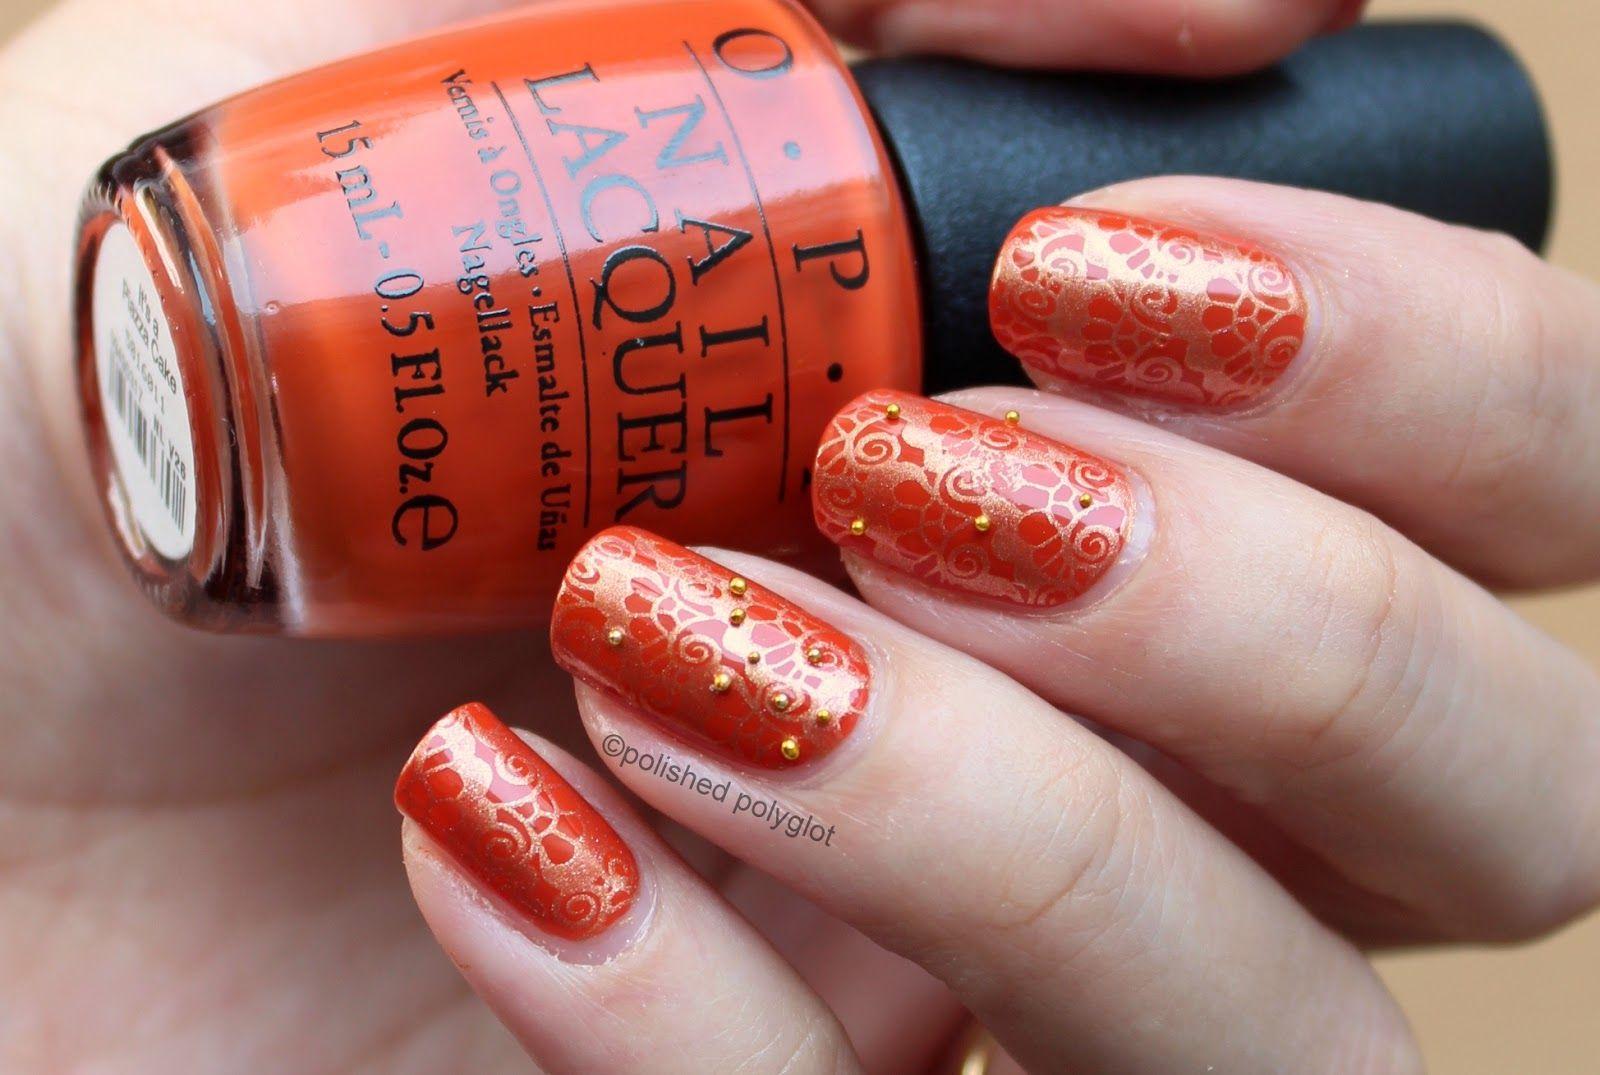 See fancy nail art using OPI Nail Polish from Venice collection ...